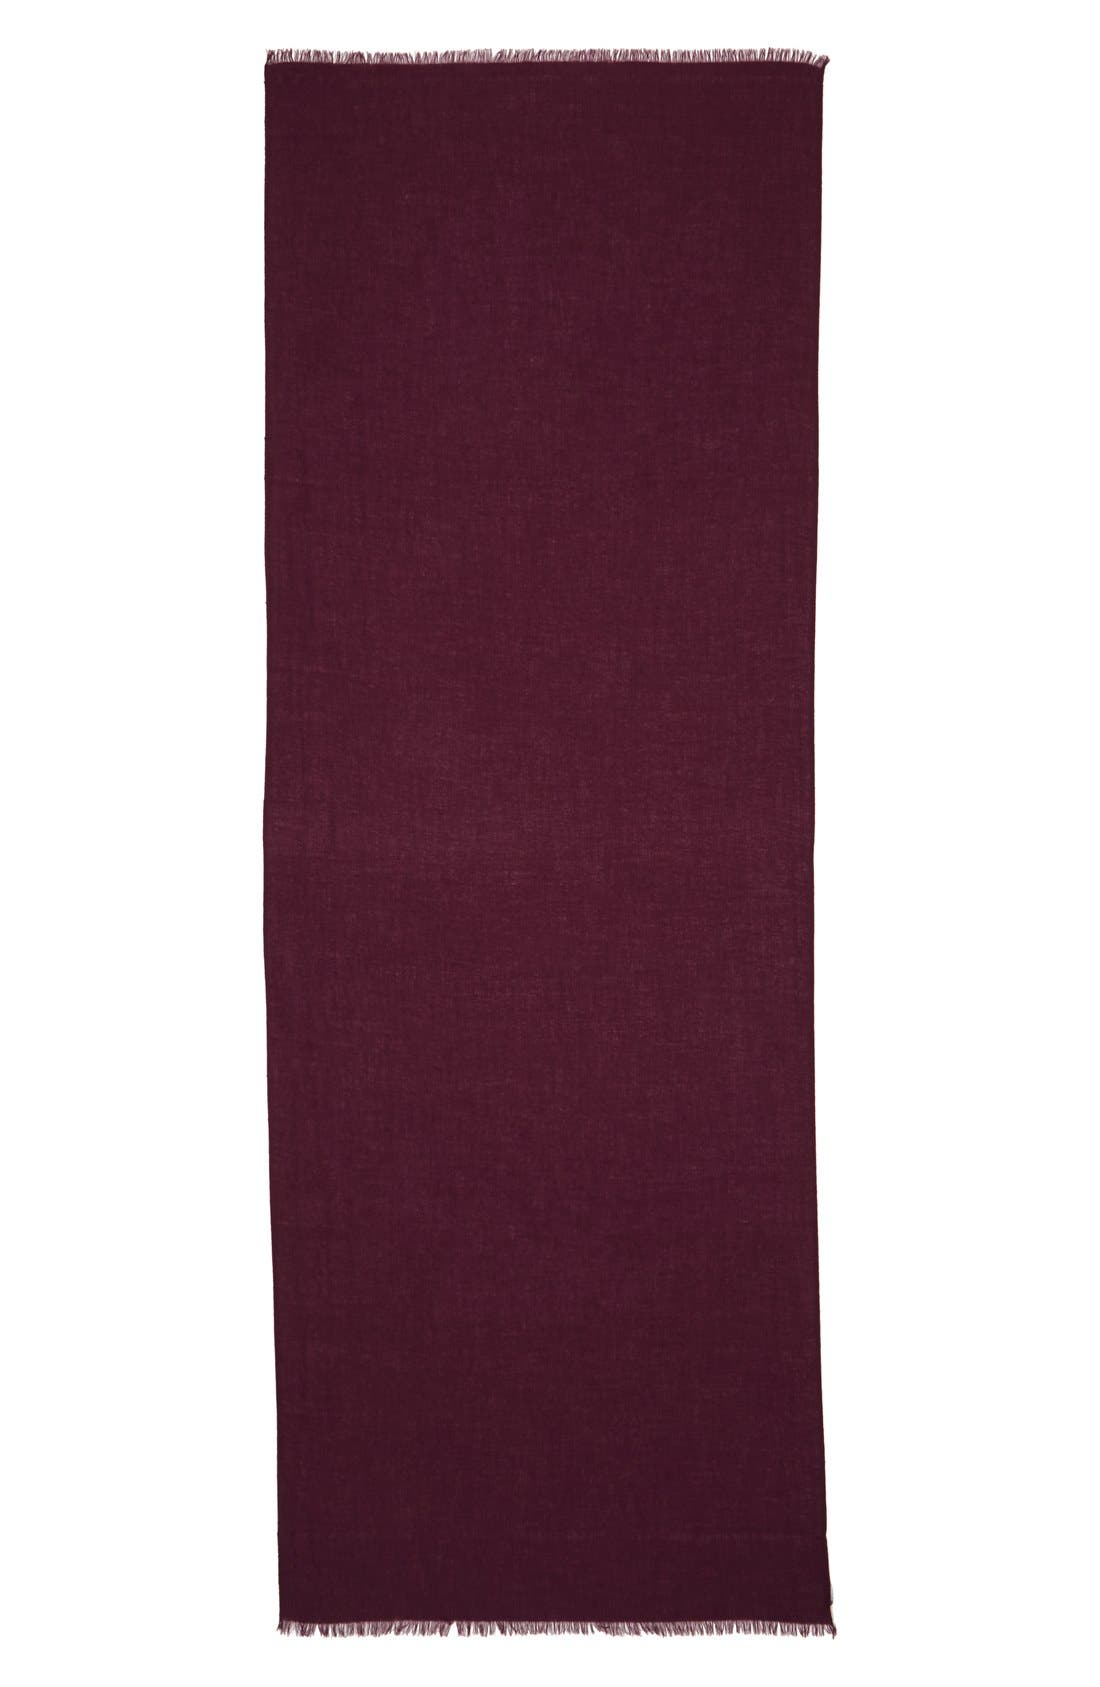 Wool & Cashmere Wrap,                             Alternate thumbnail 68, color,